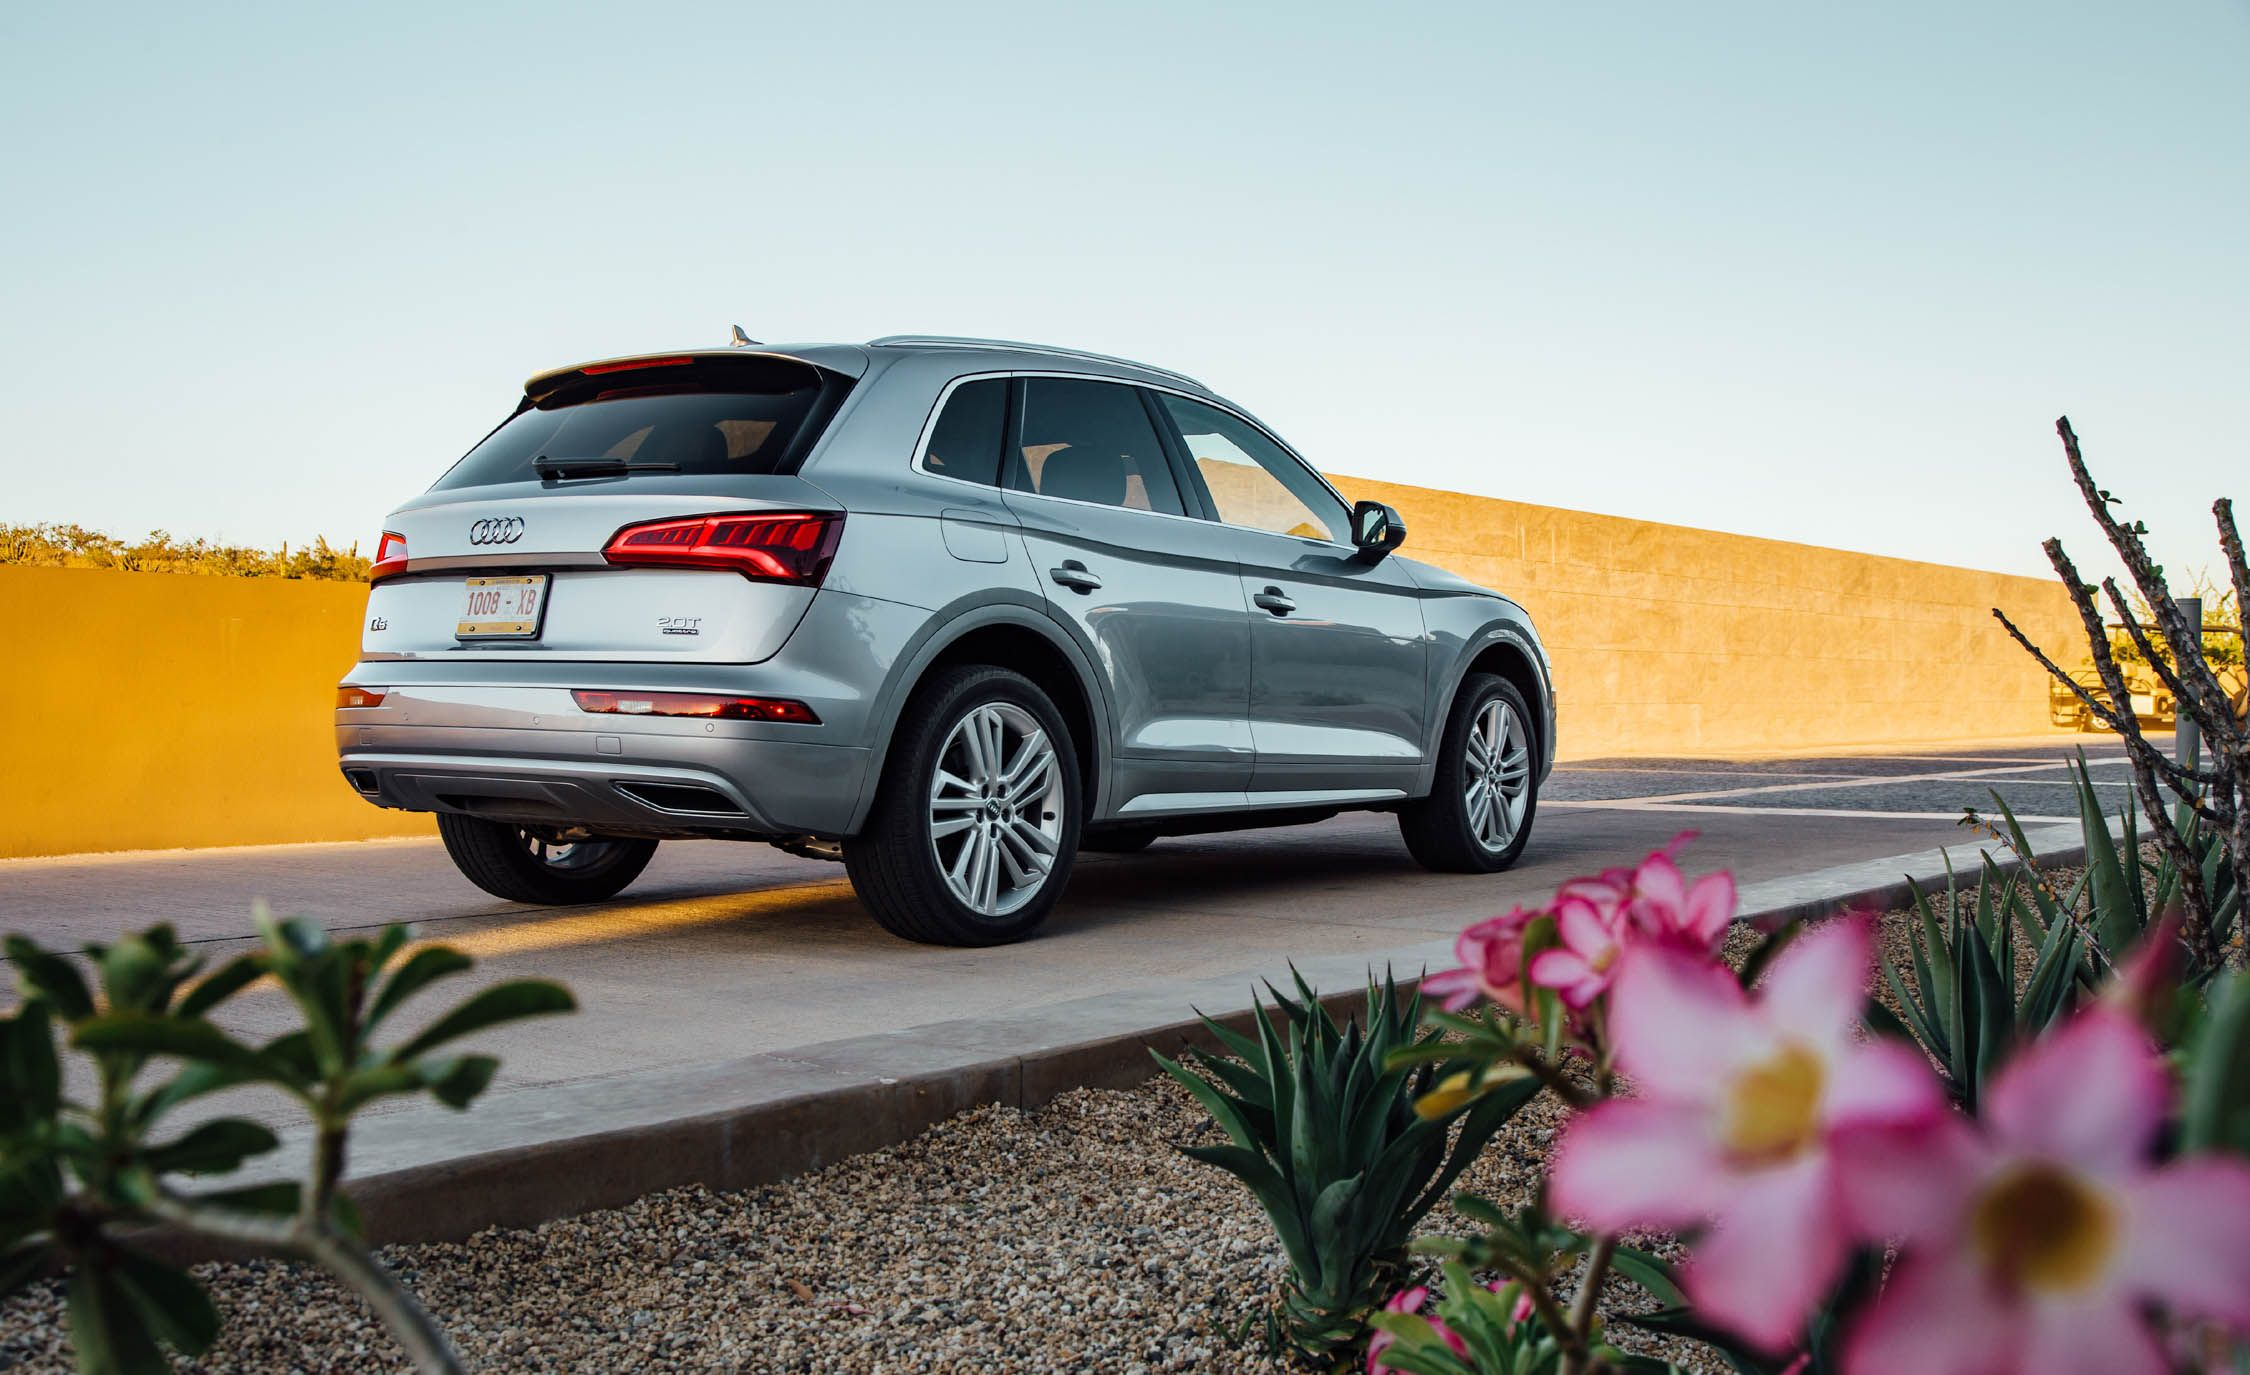 2019 Audi Q5 Reviews Audi Q5 Price Photos And Specs Car And Driver